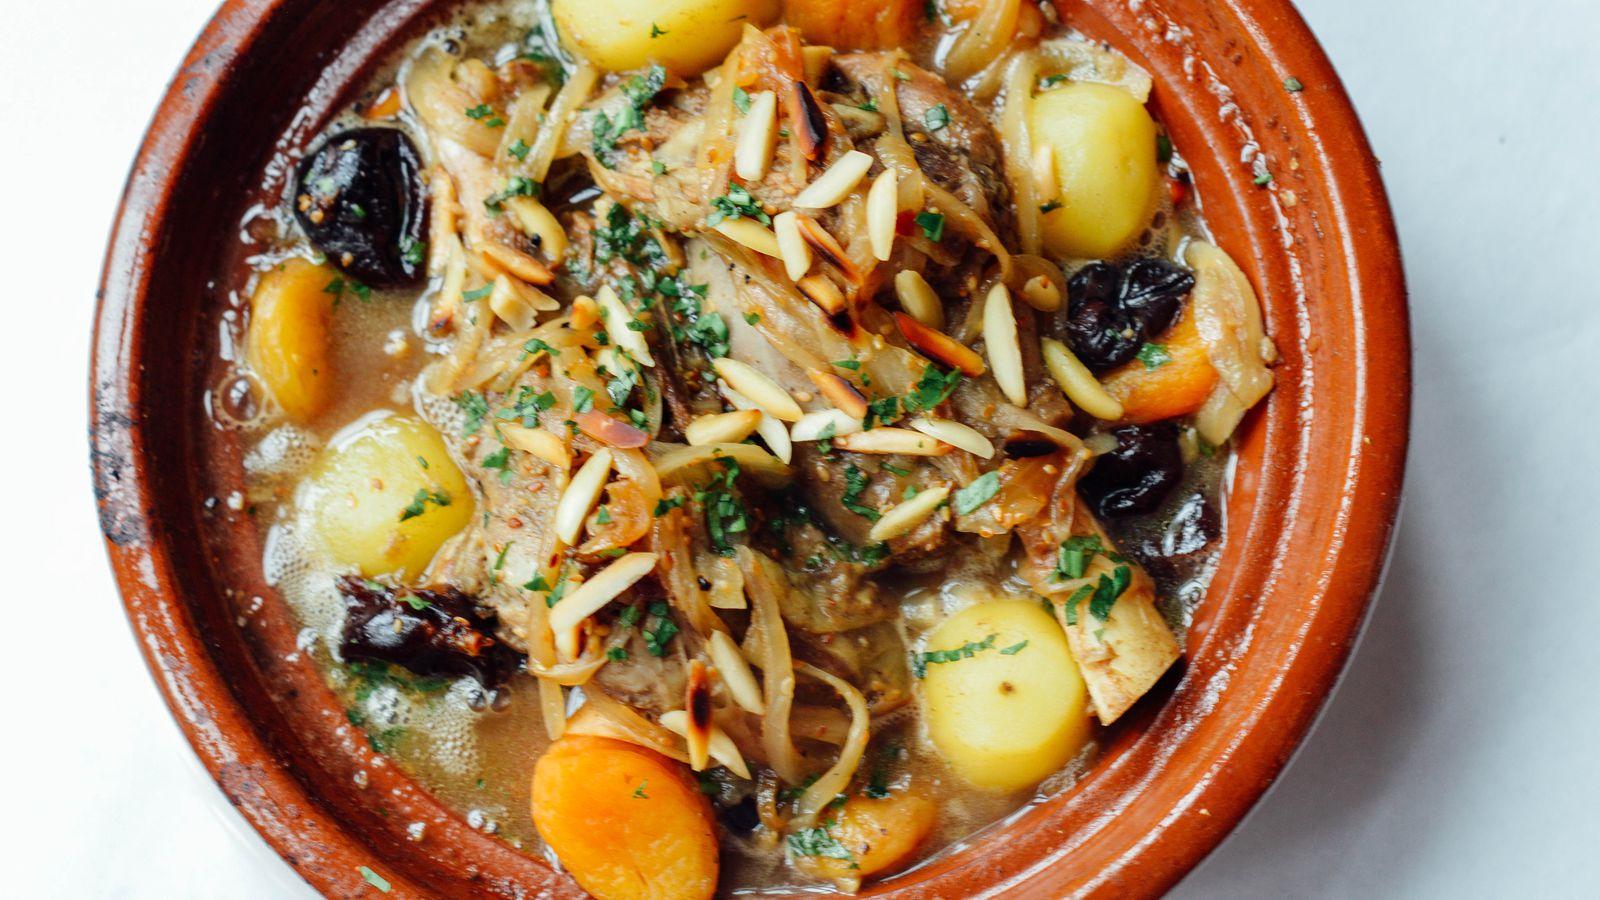 Bar omar brings algerian food to williamsburg eater ny for Algerien cuisine